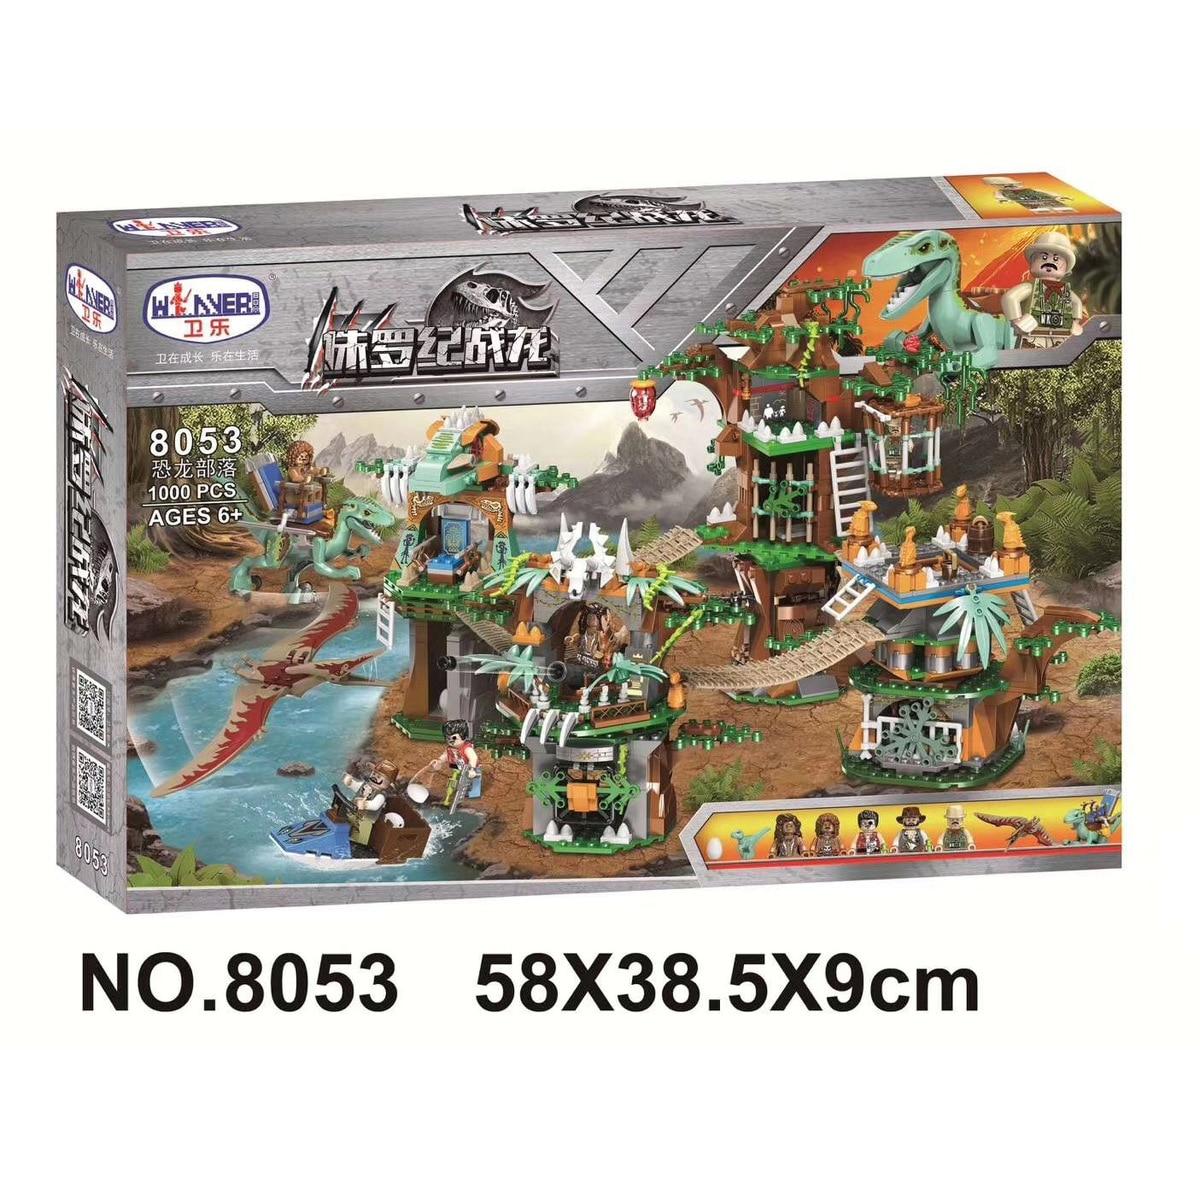 Winner 8053 1000pcs Capture The Dinosaurs Tribe Building Blocks Bricks Educational Kids Toys Compatible Leogings Jurassic World